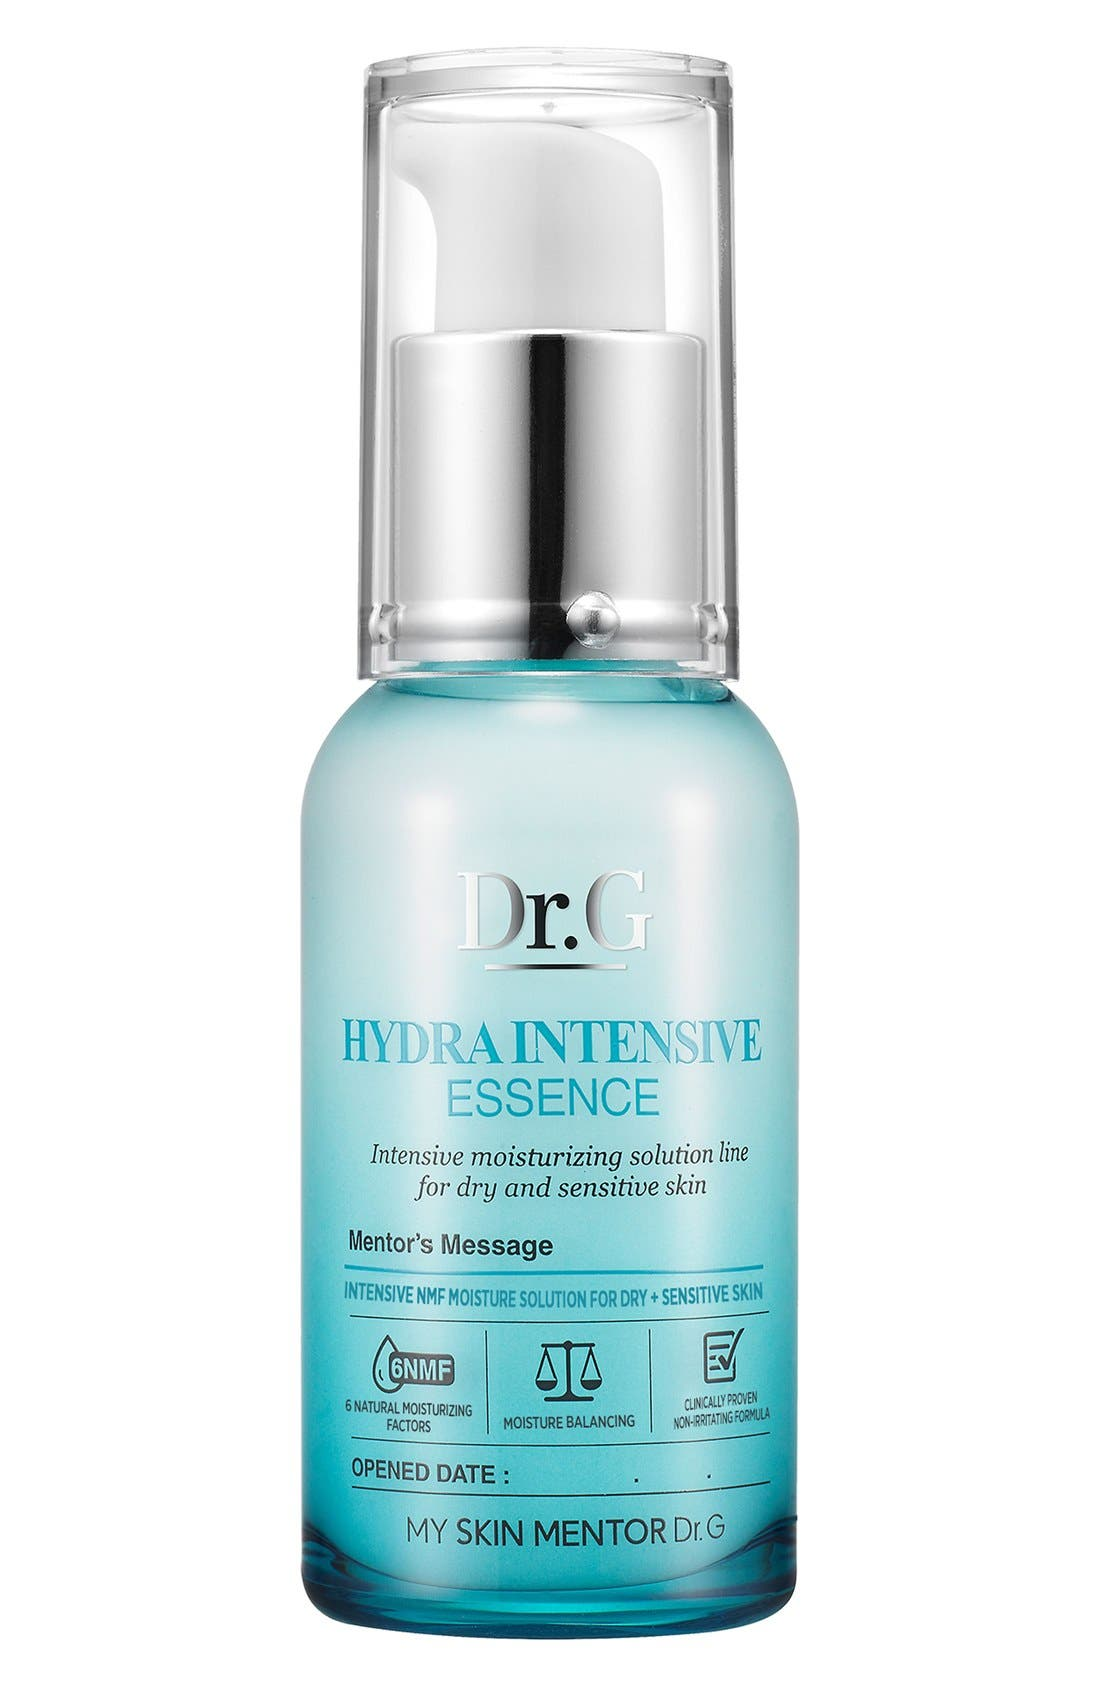 My Skin Mentor Dr. G Beauty Hydra Intensive Essence